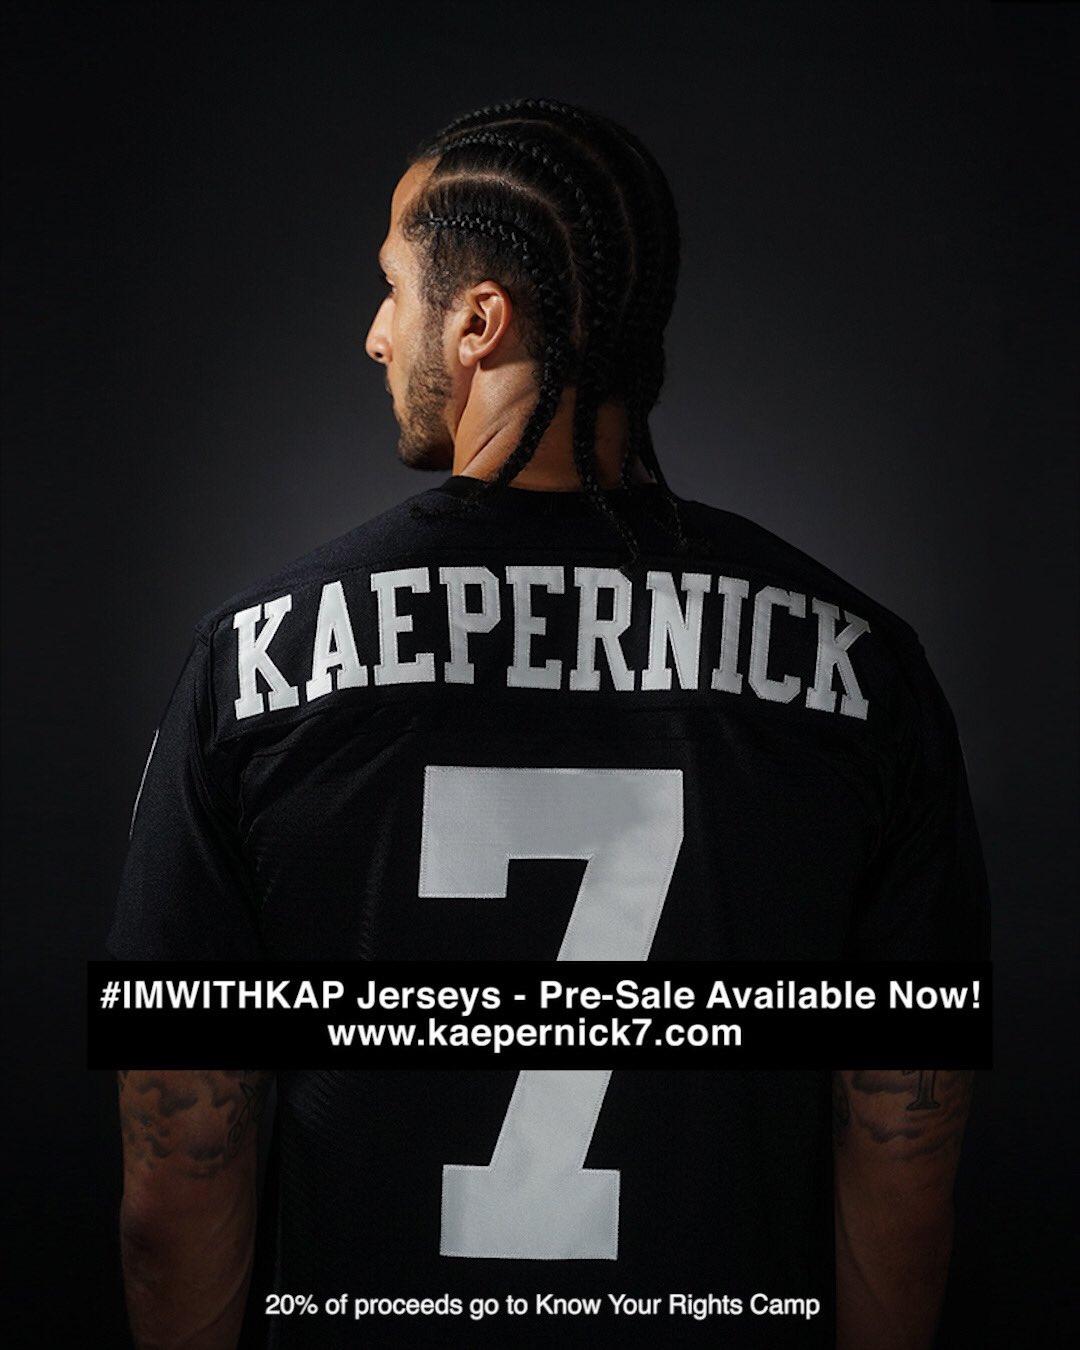 0a828235 Colin Kaepernick on Twitter: